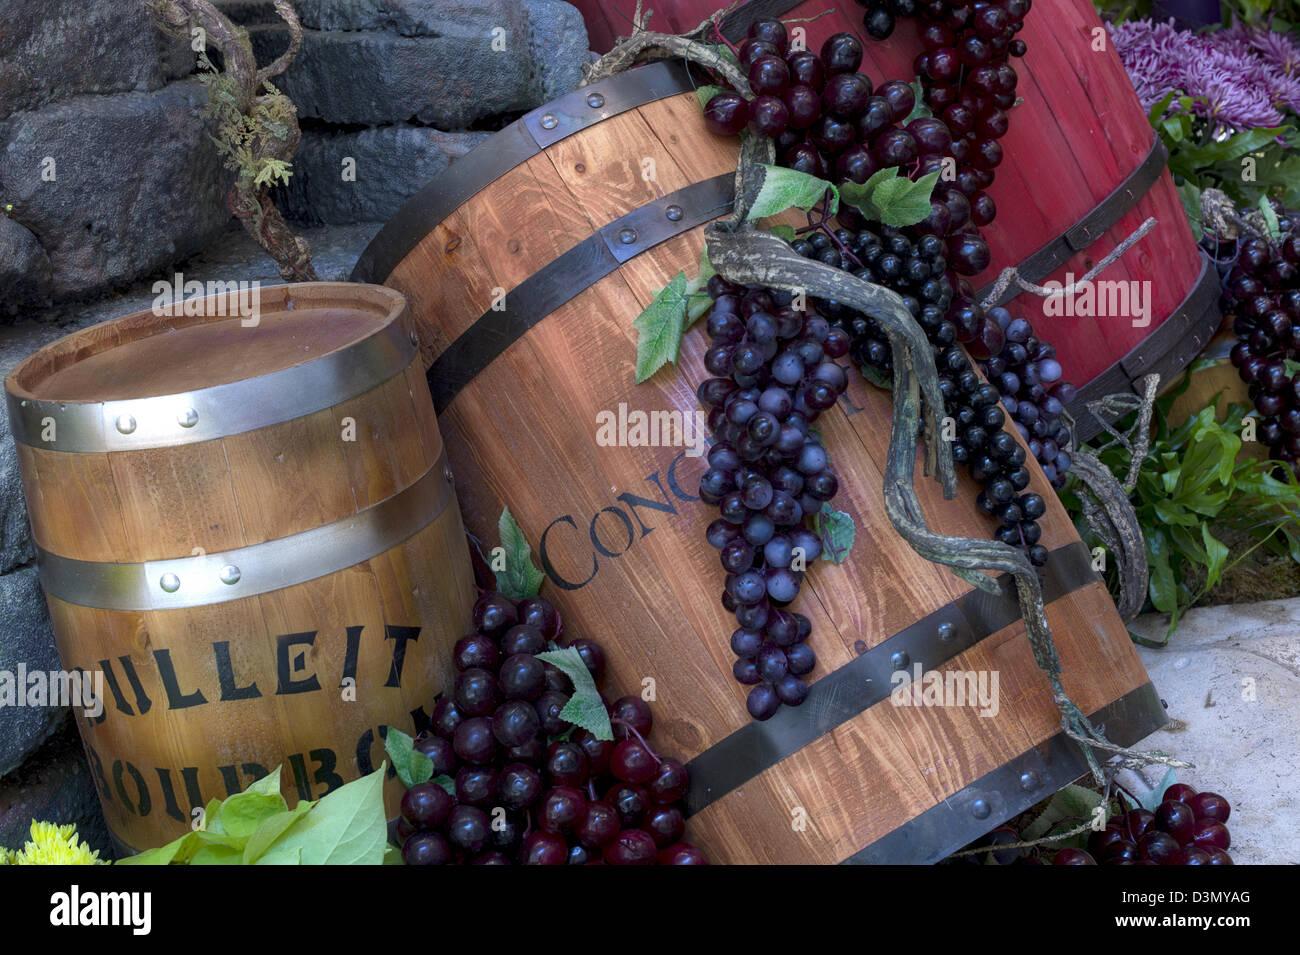 Wine barrel and grape display. - Stock Image